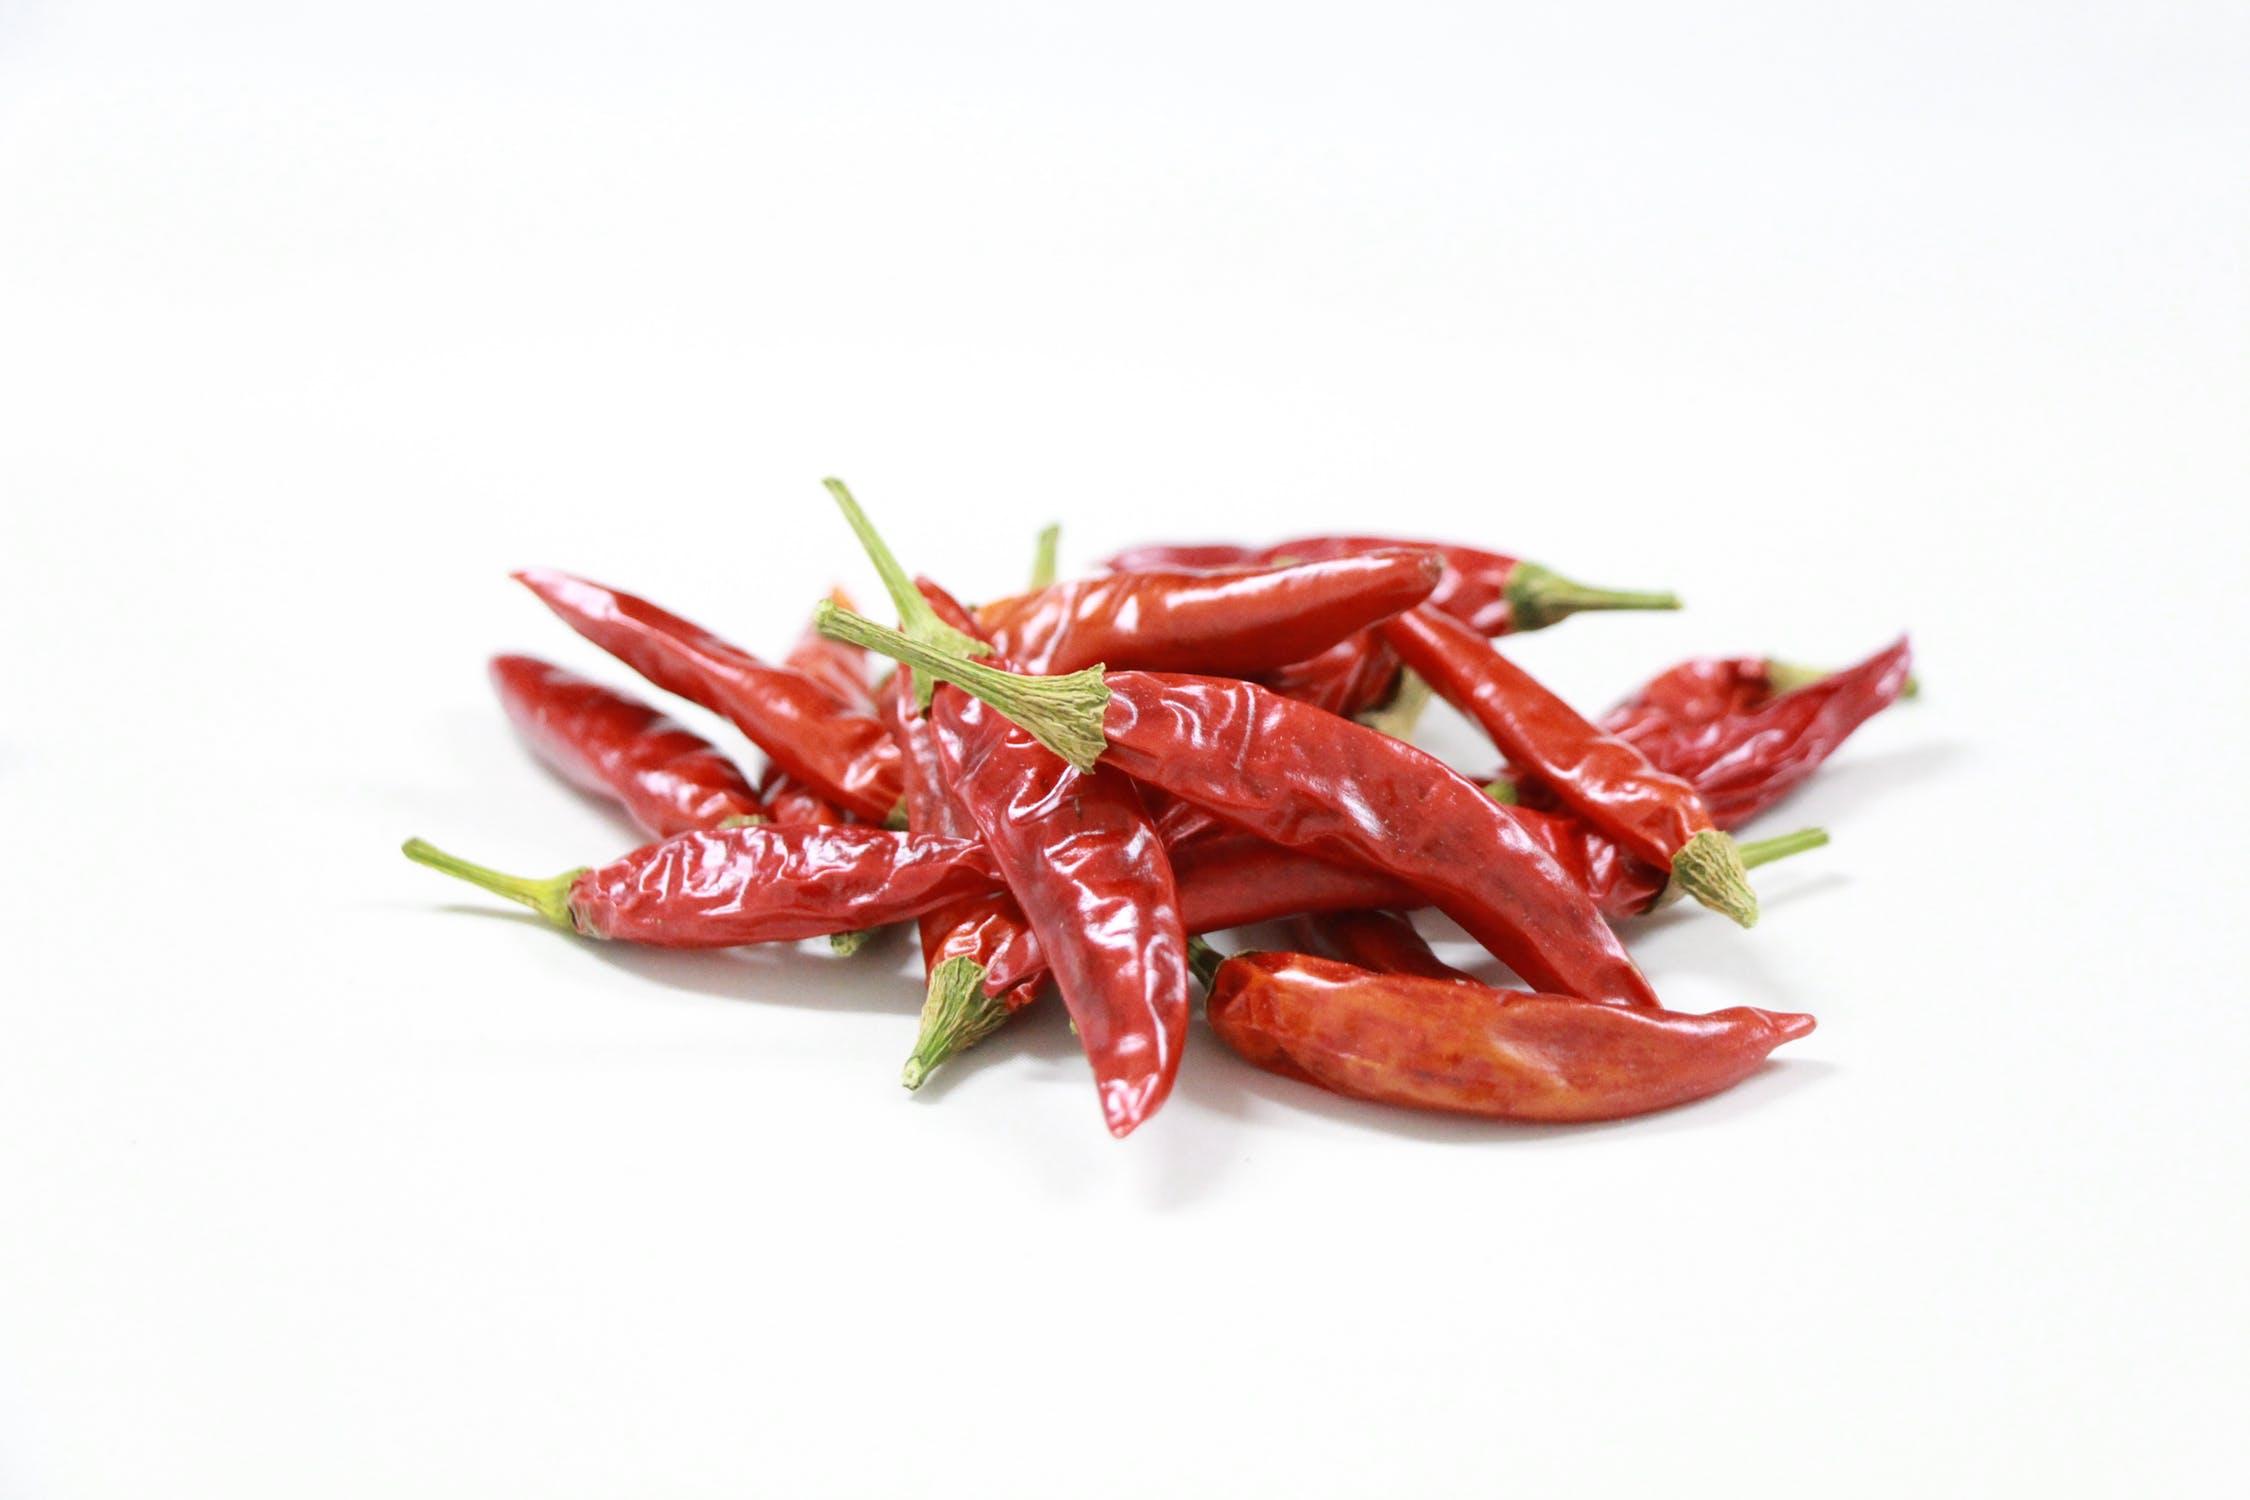 red pepper chili pepper metabolism